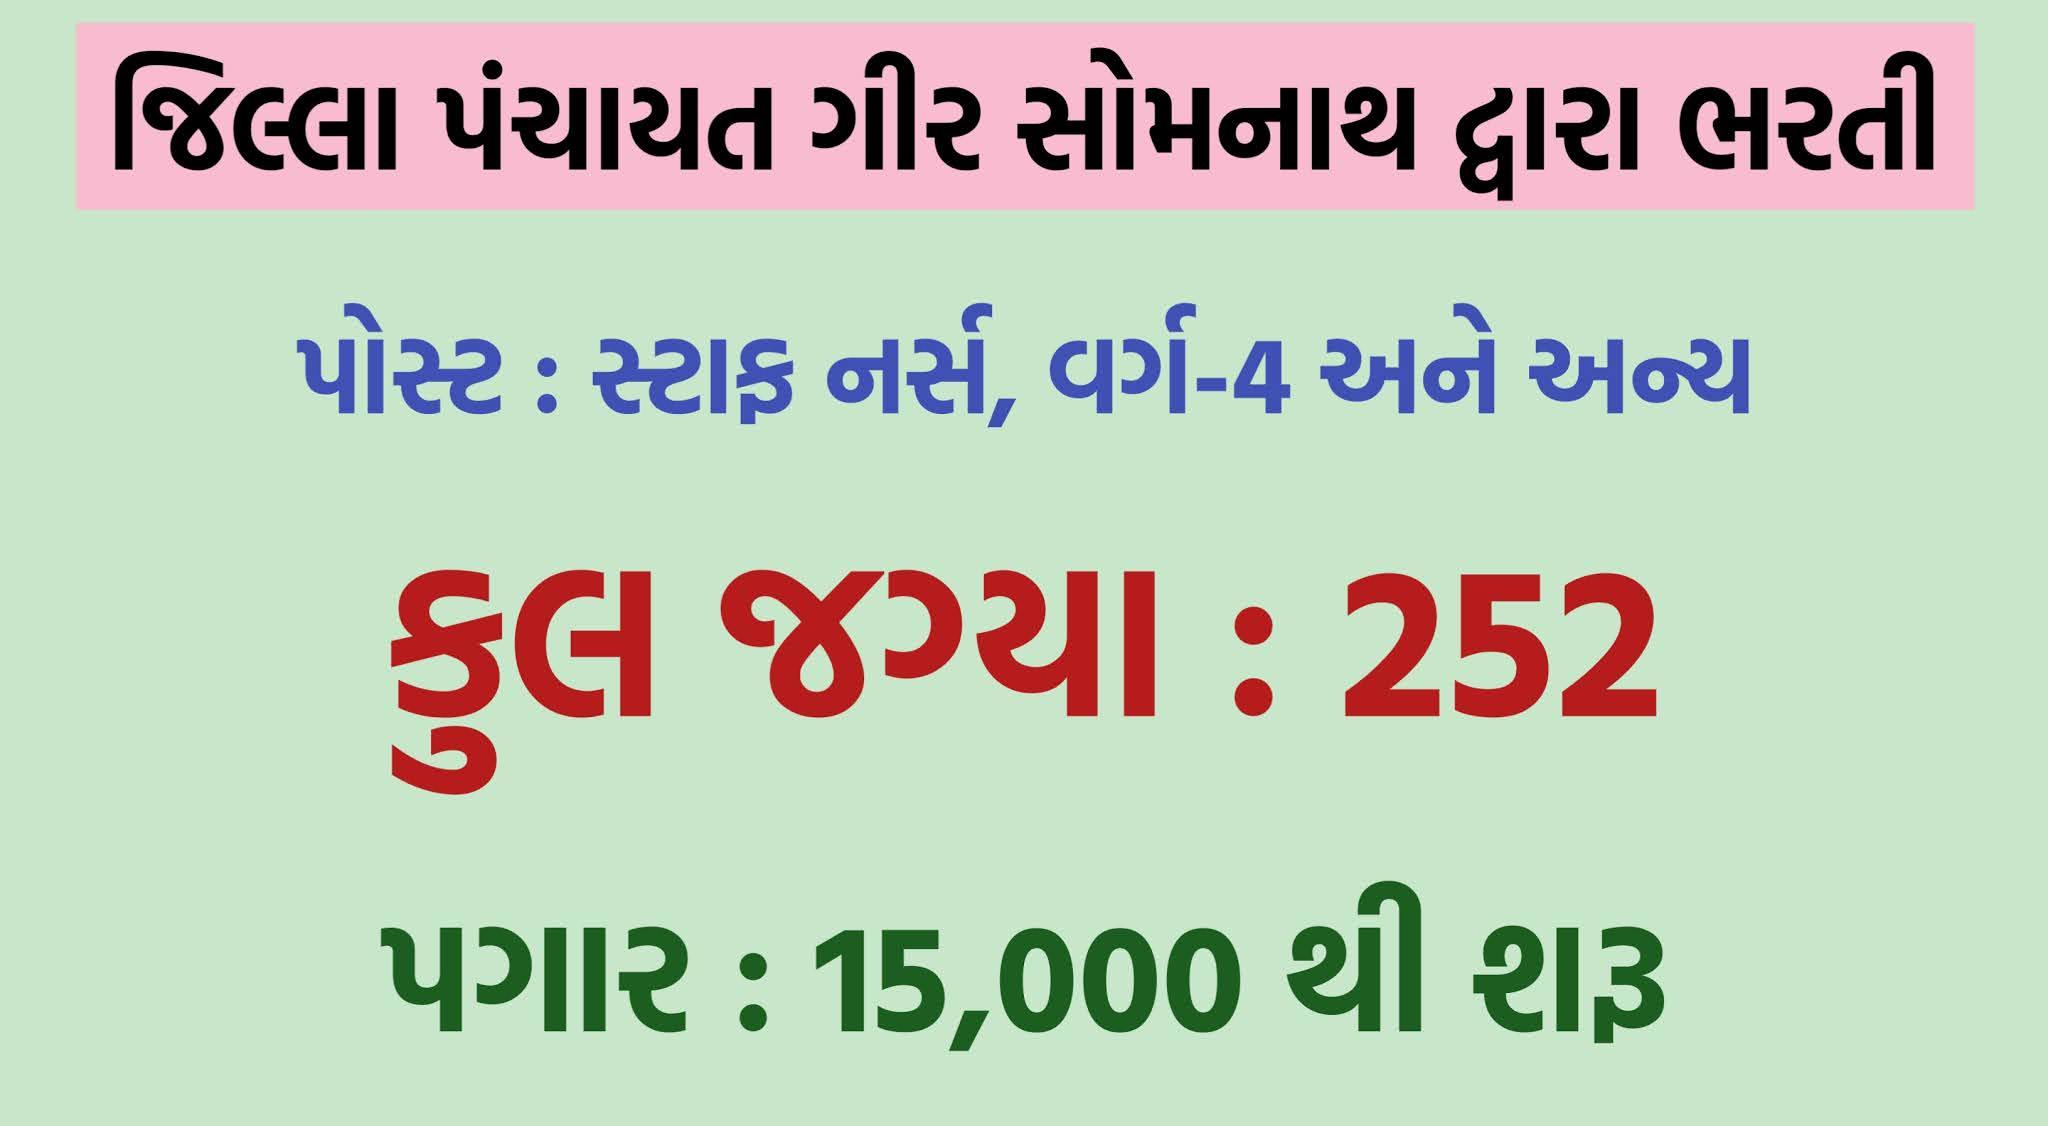 District Panchayat Gir Somnath Recruitment 2021